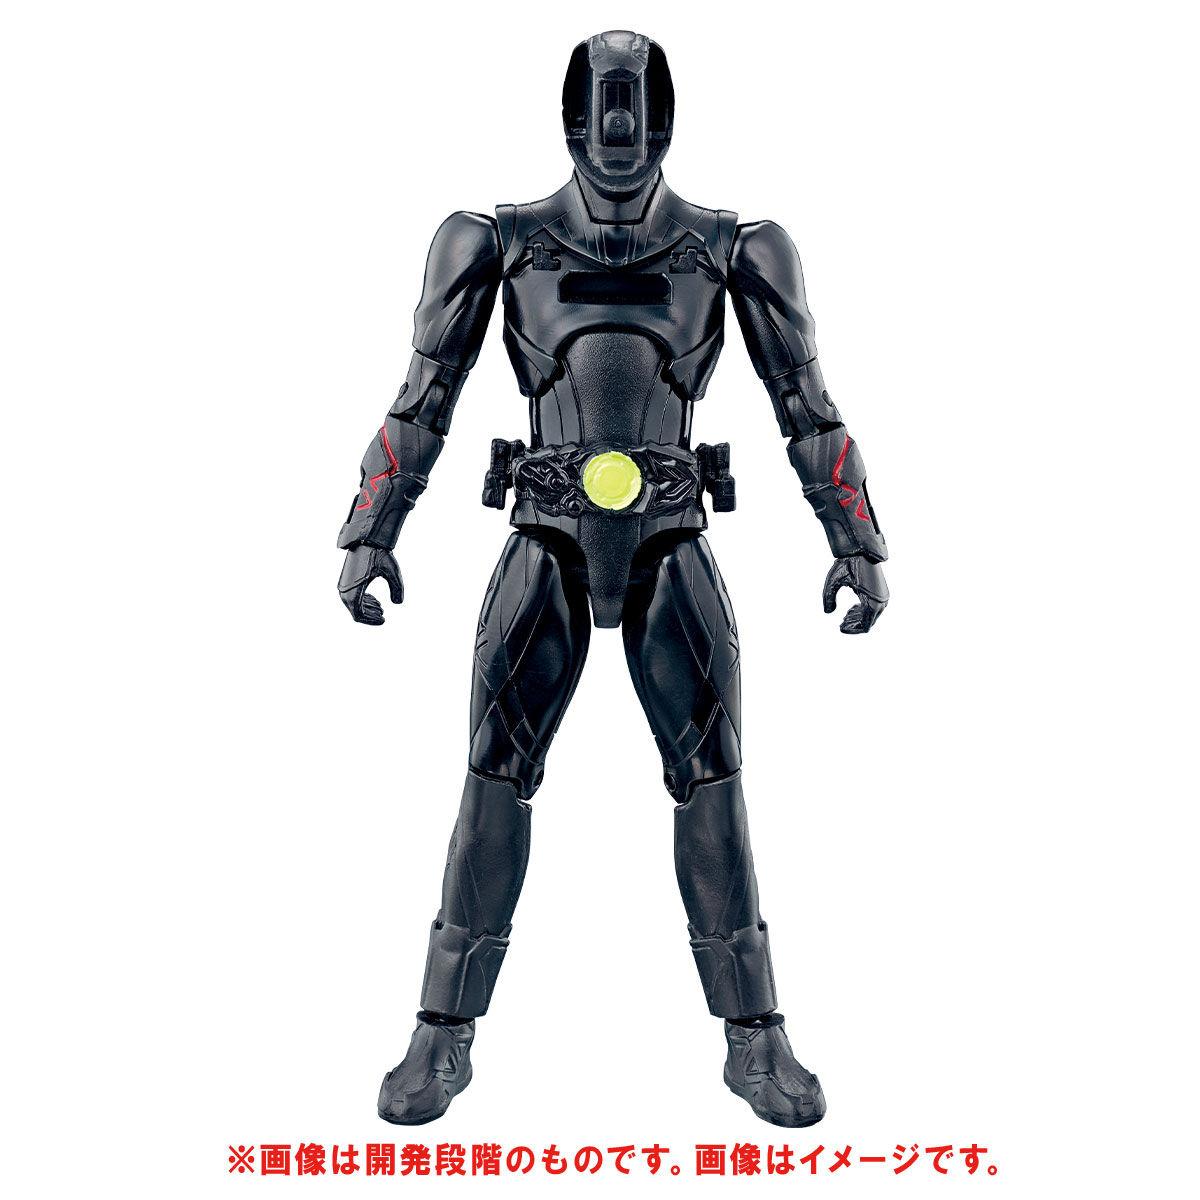 RKF RIDER KICK'S FIGURE 仮面ライダーゼロワン ハイブリッドライズフィギュア 素体